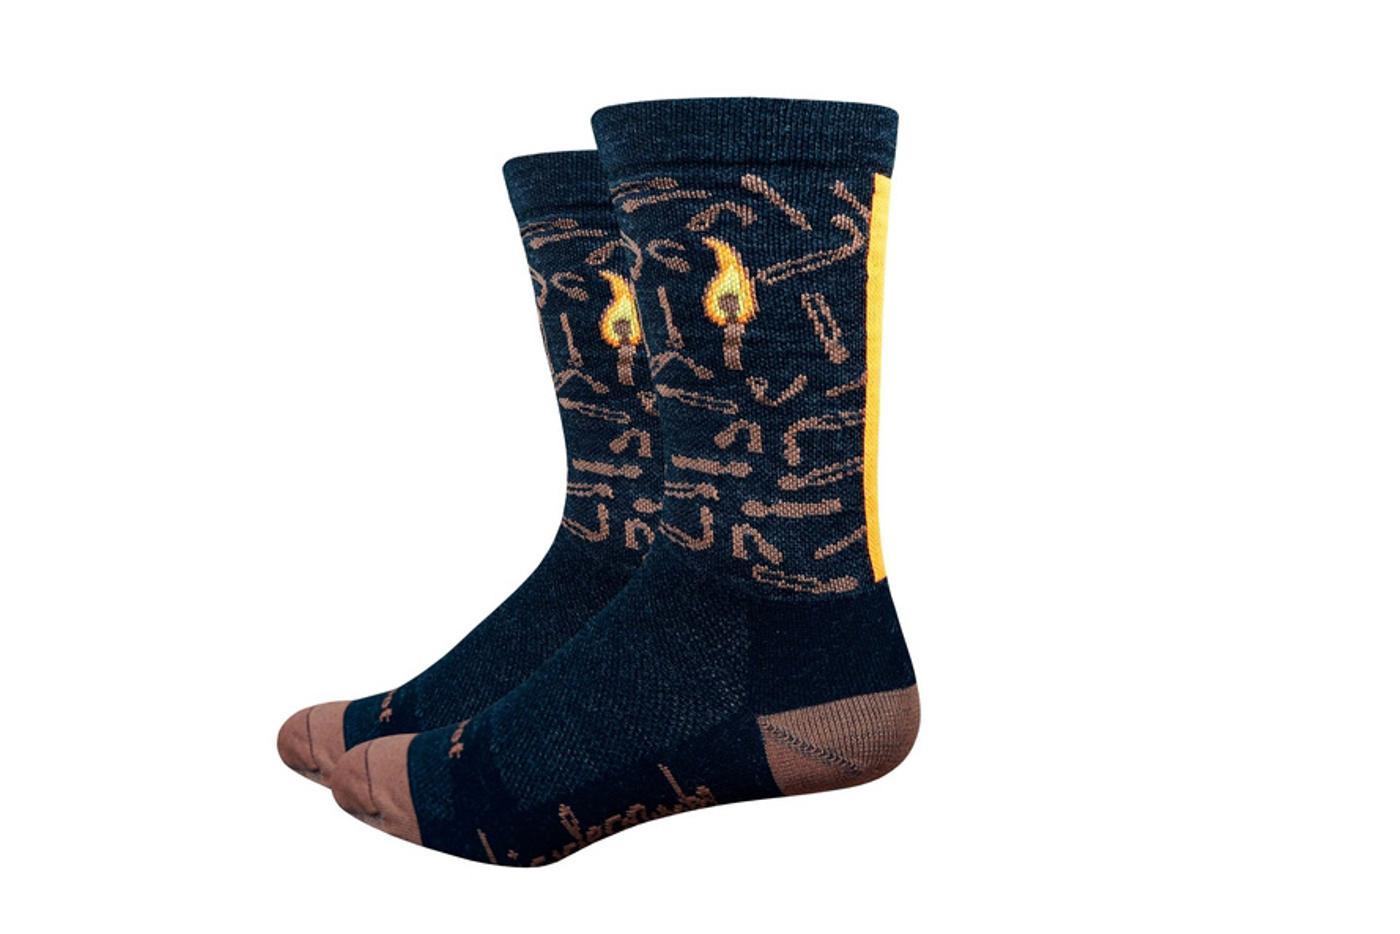 Bicycle Crumbs Designed Three Socks for DeFeet